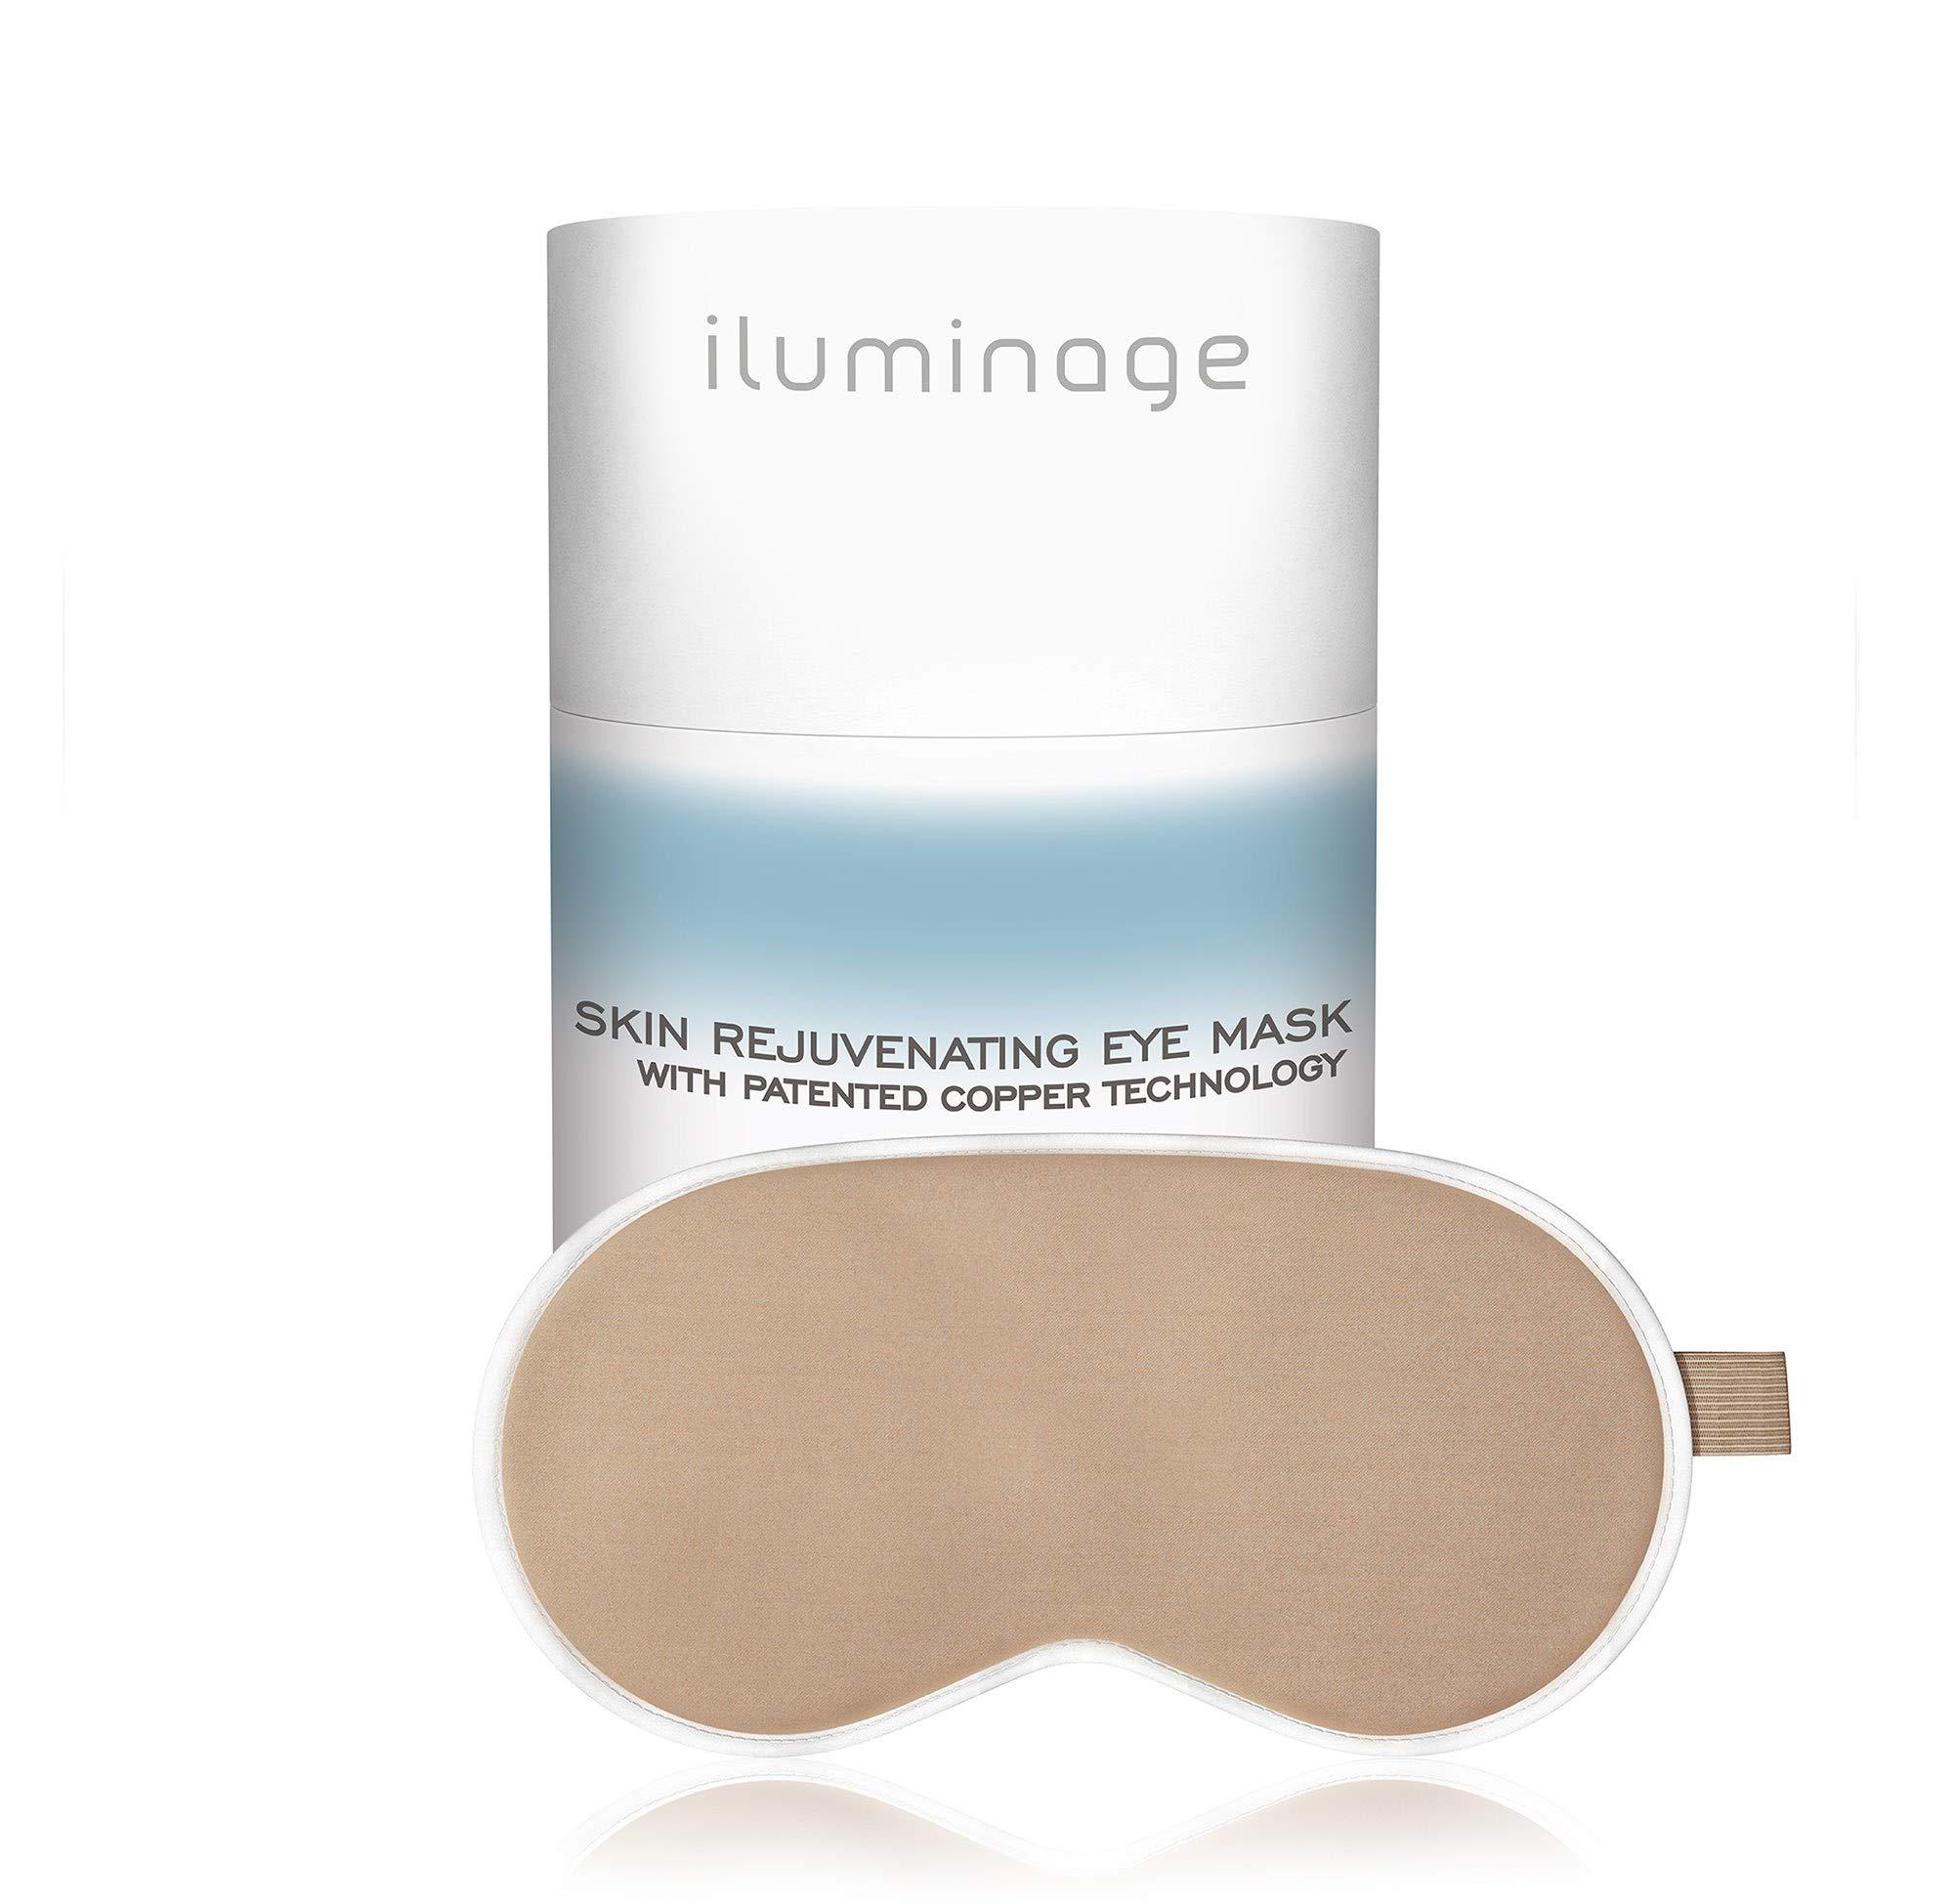 Iluminage. Skin Rejuvenating Eye Mask for Fine Lines Reduction with Anti-Aging Copper Technology by Iluminage.